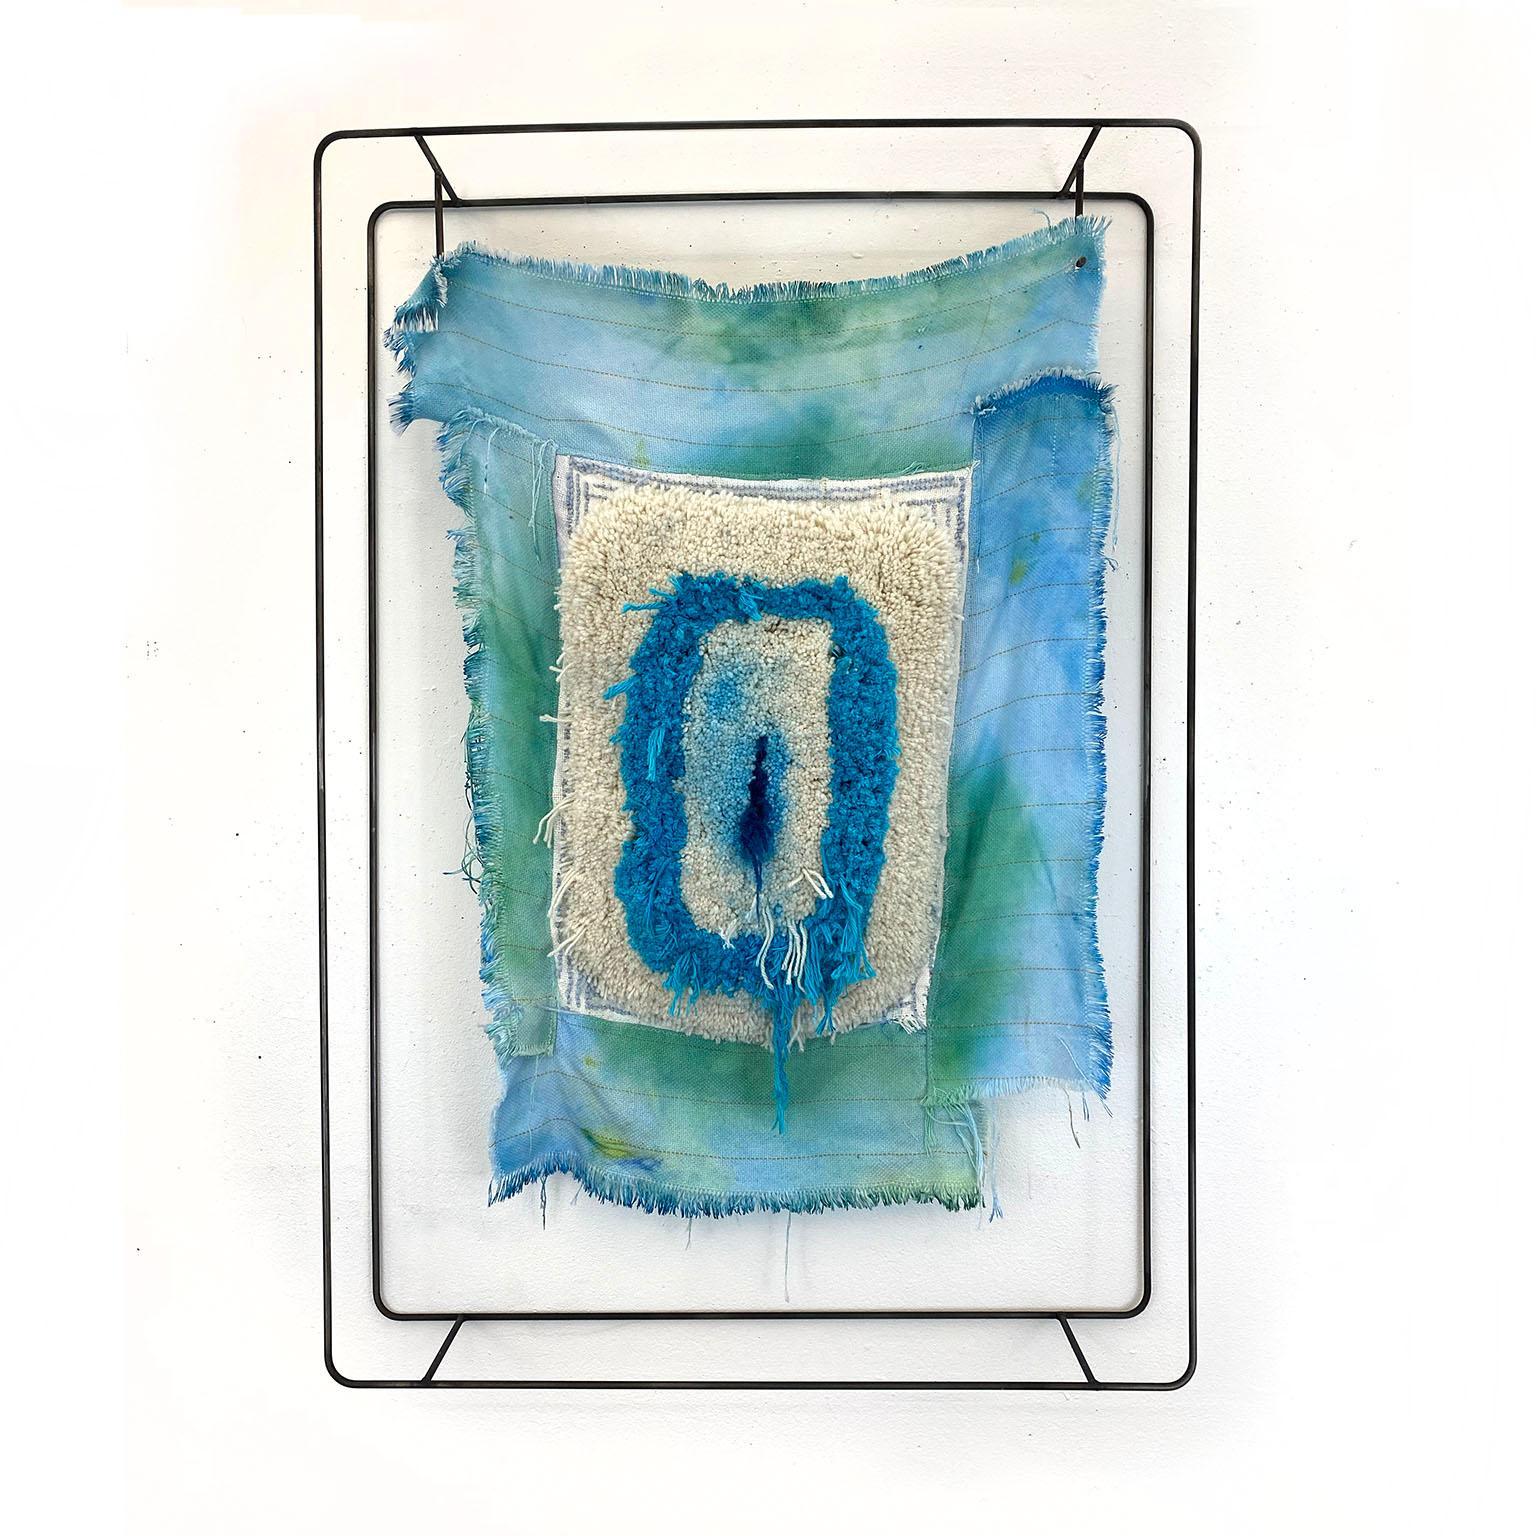 Textile Sculpture on Steel frame: 'Collar'